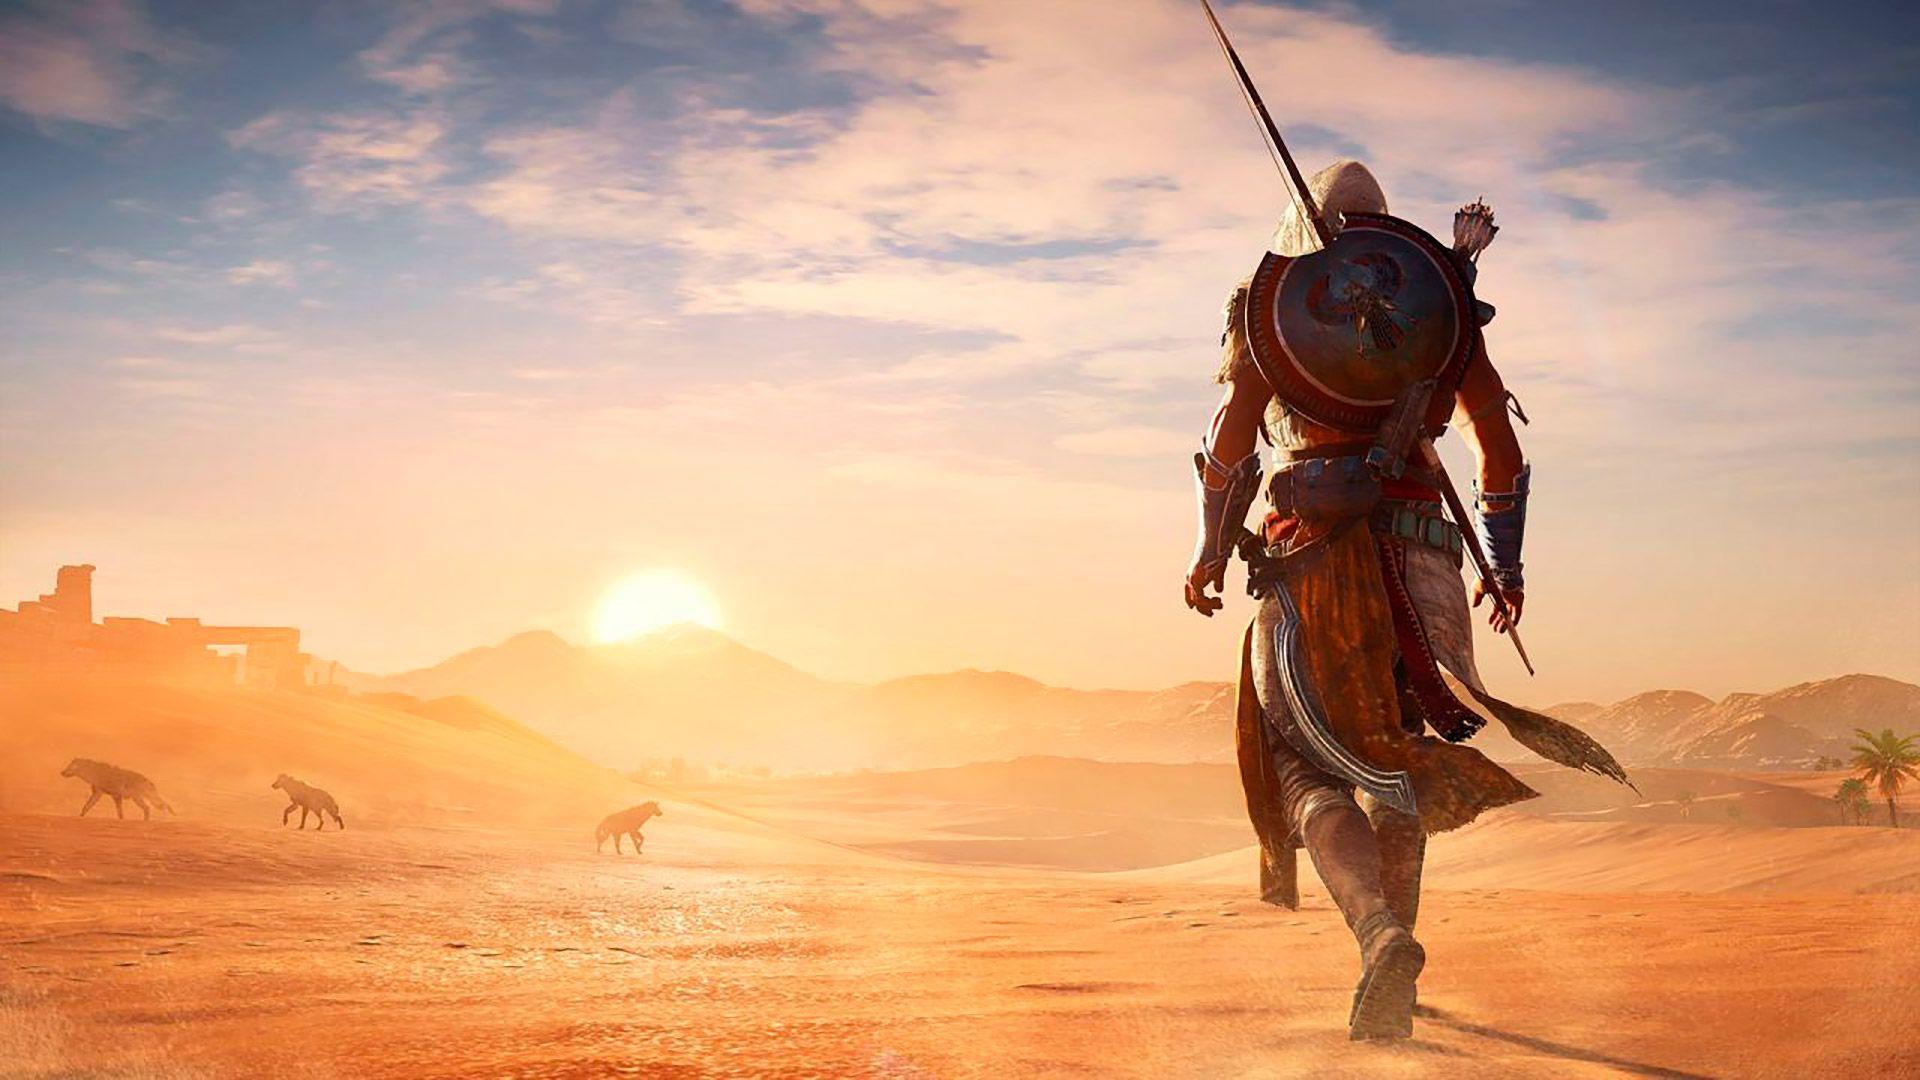 Assassin's Creed Истоки изображение 2